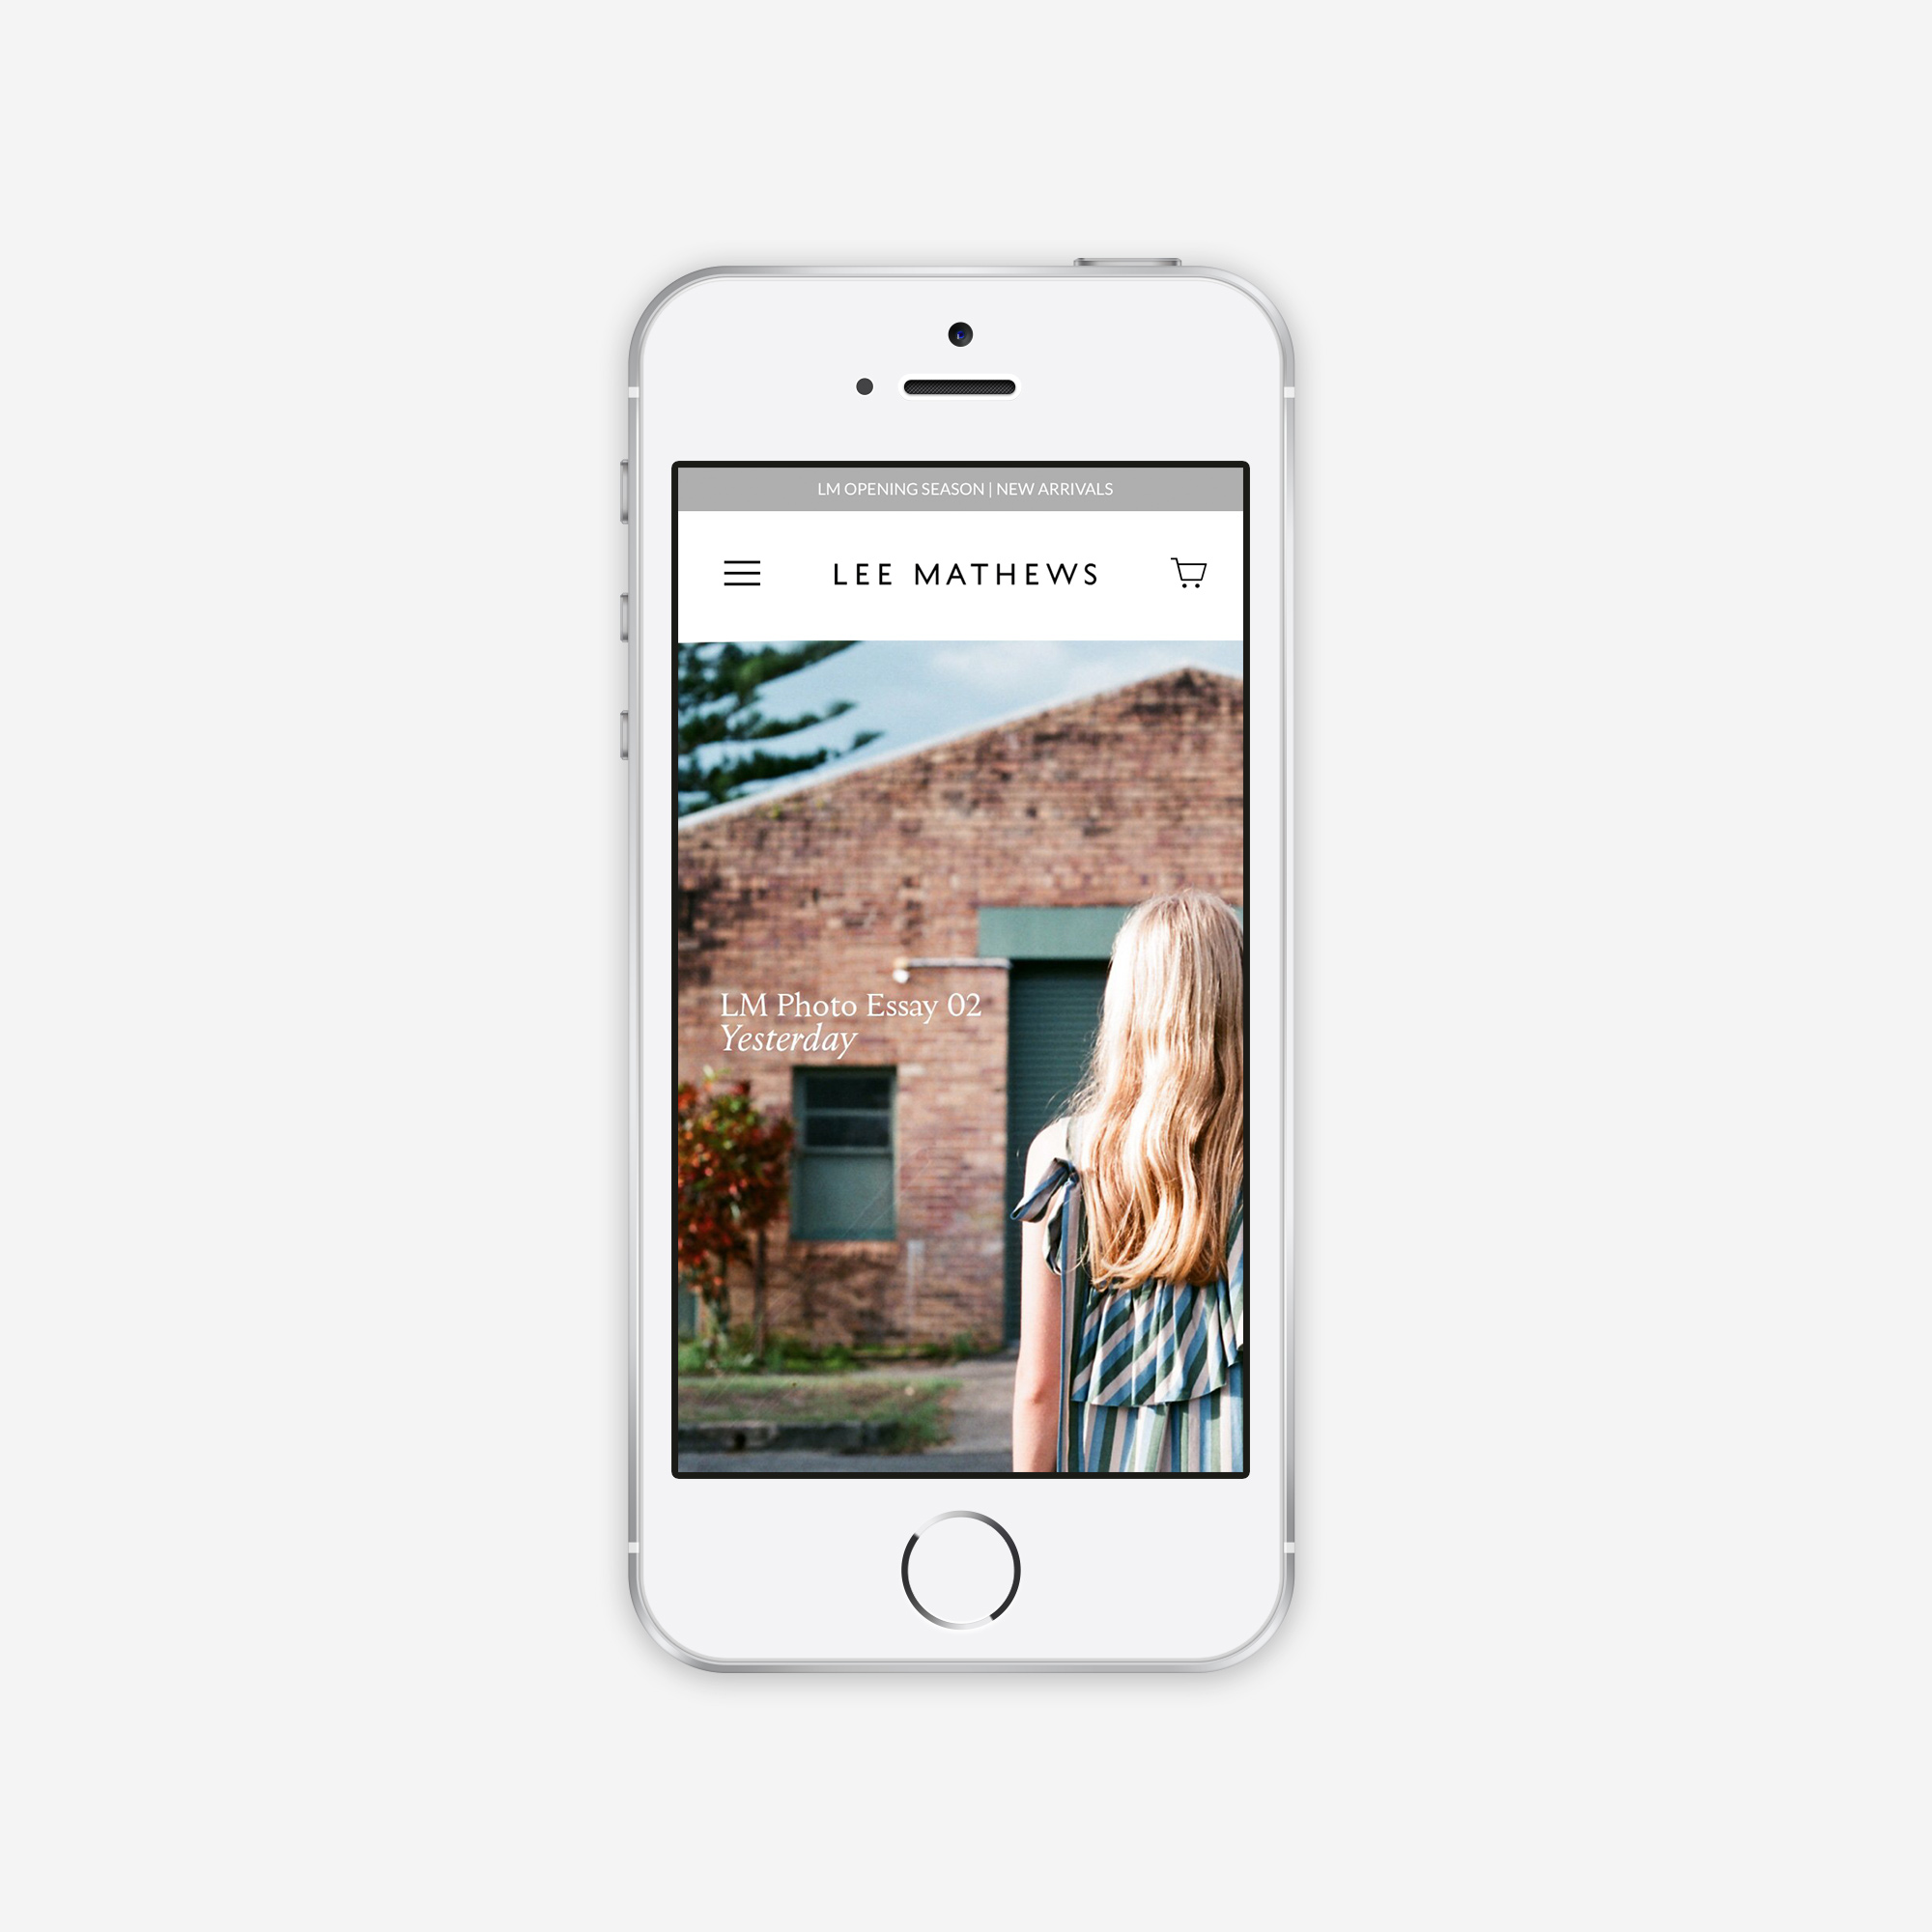 Iphone-website.jpg